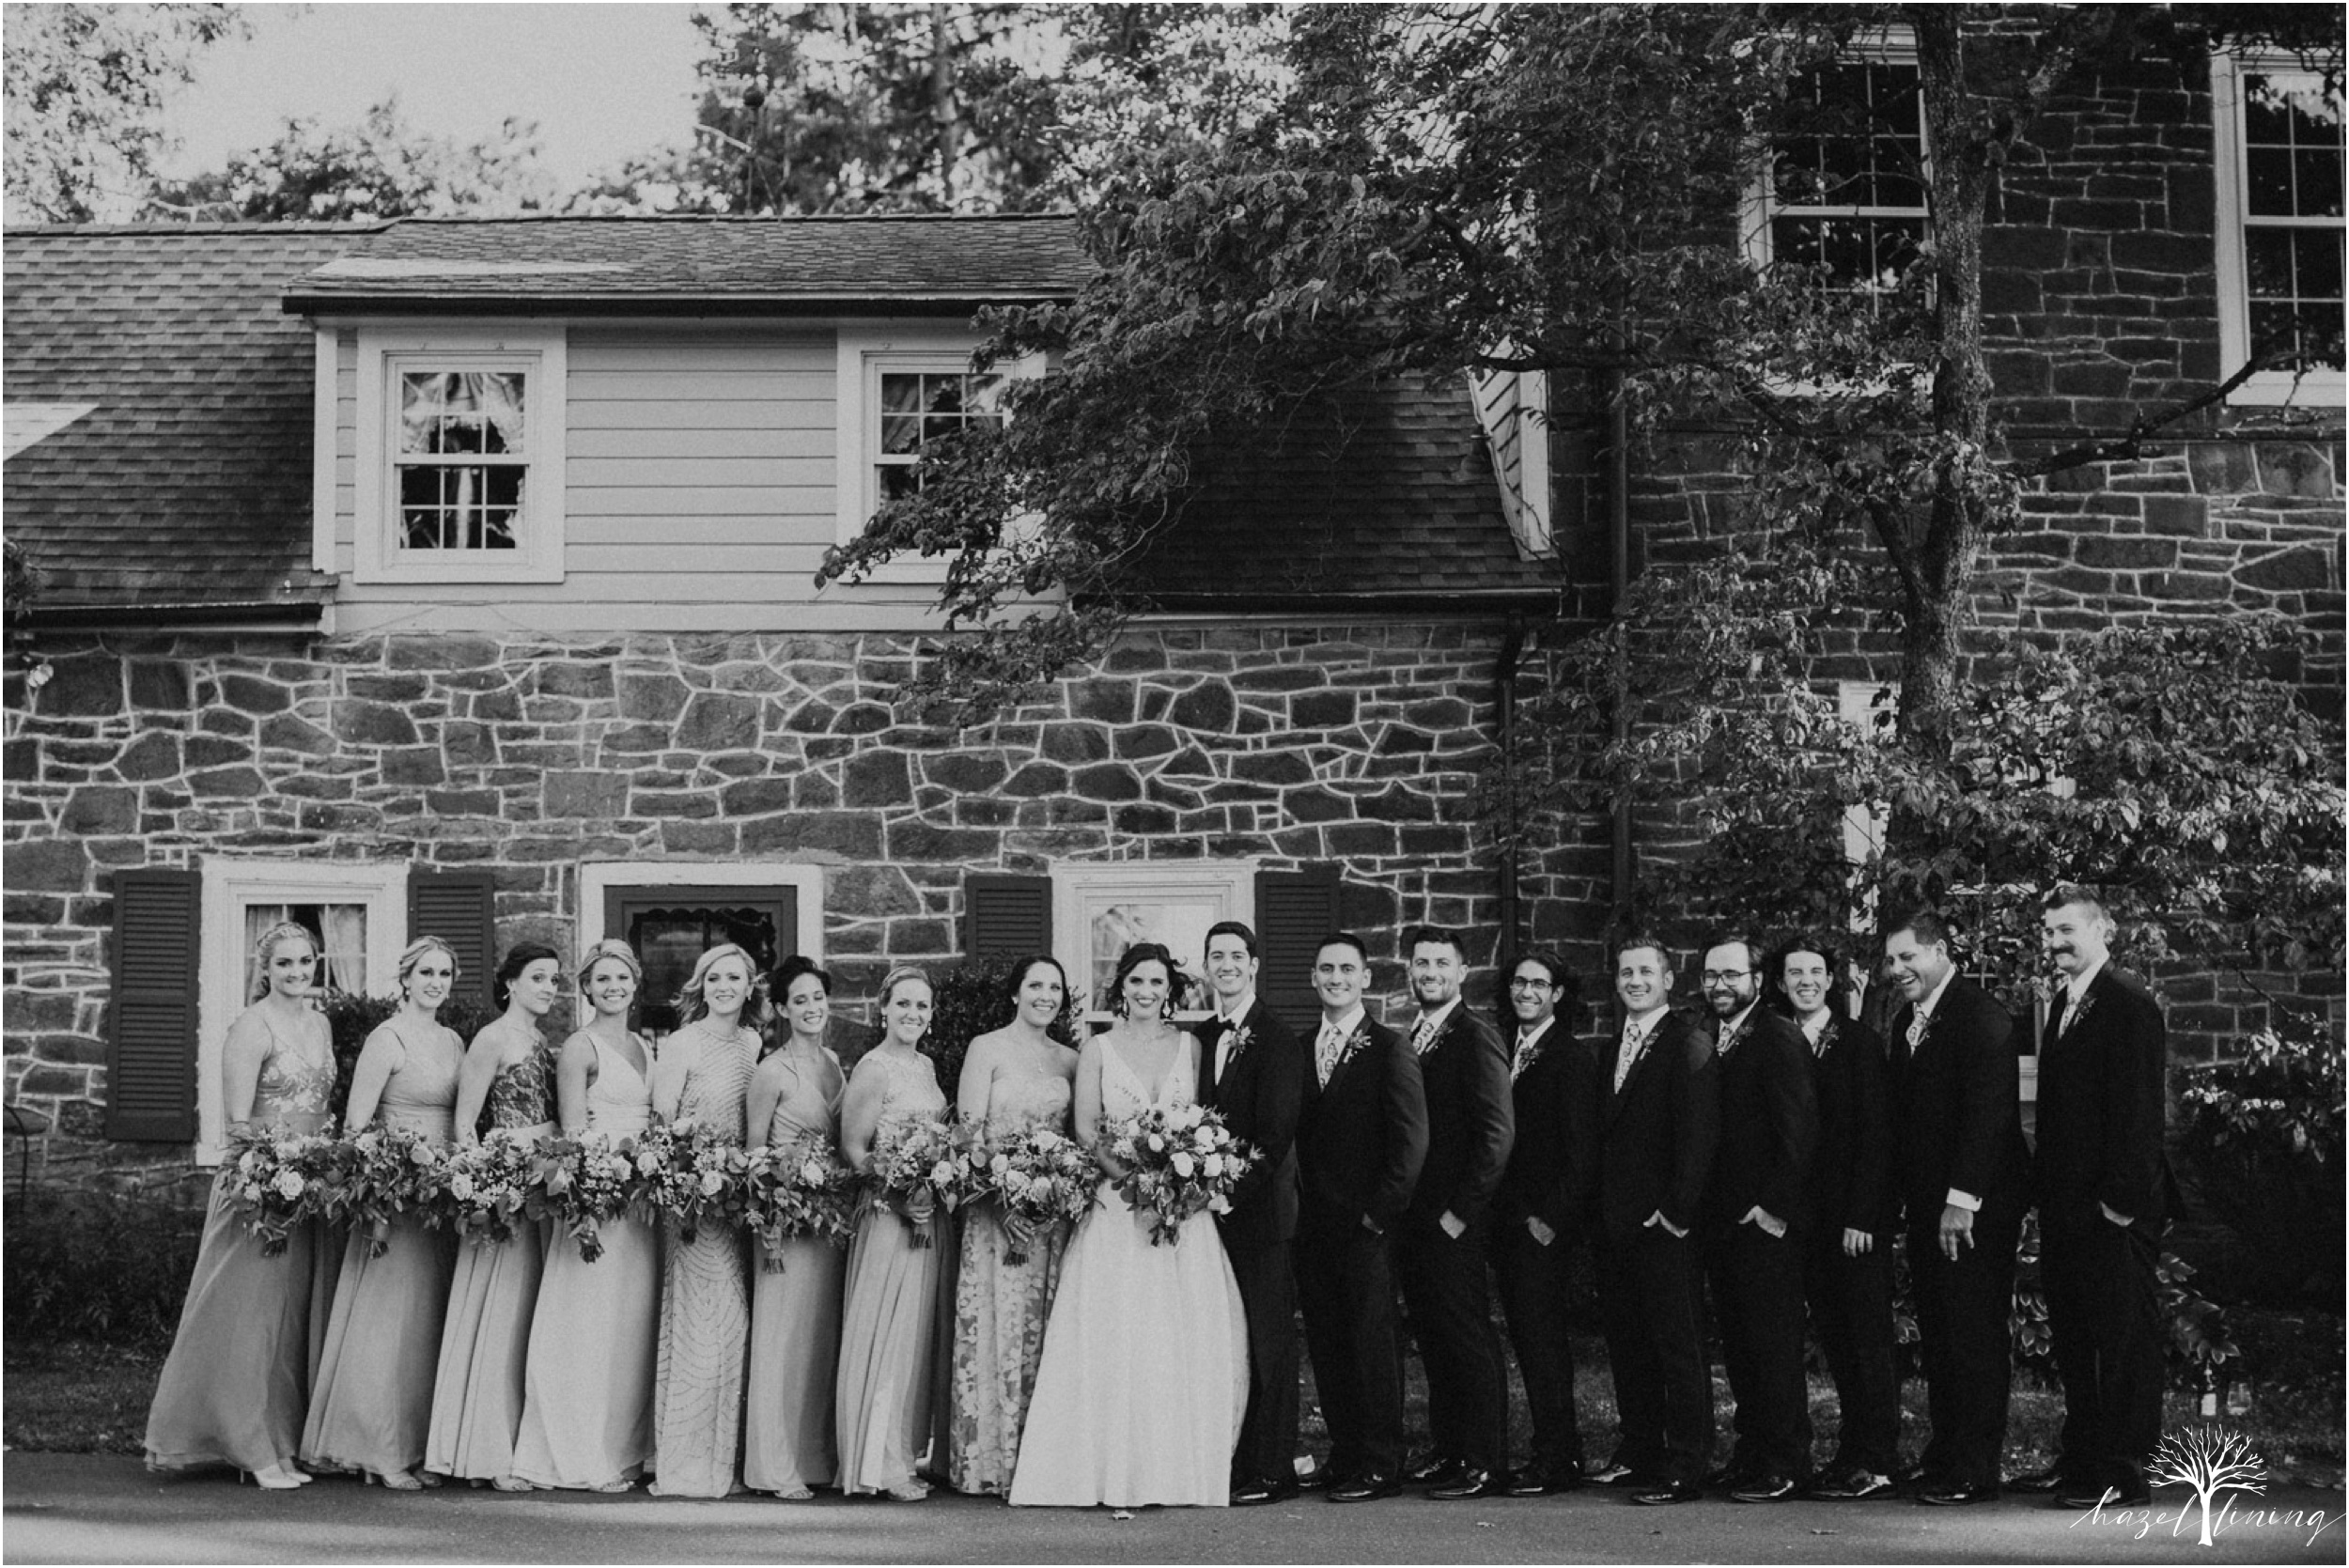 maureen-hepner-anthony-giordano-rose-bank-winery-newtow-pennsylvania-luxury-summer-wedding-hazel-lining-photography-destination-elopement-wedding-engagement-photography_0083.jpg